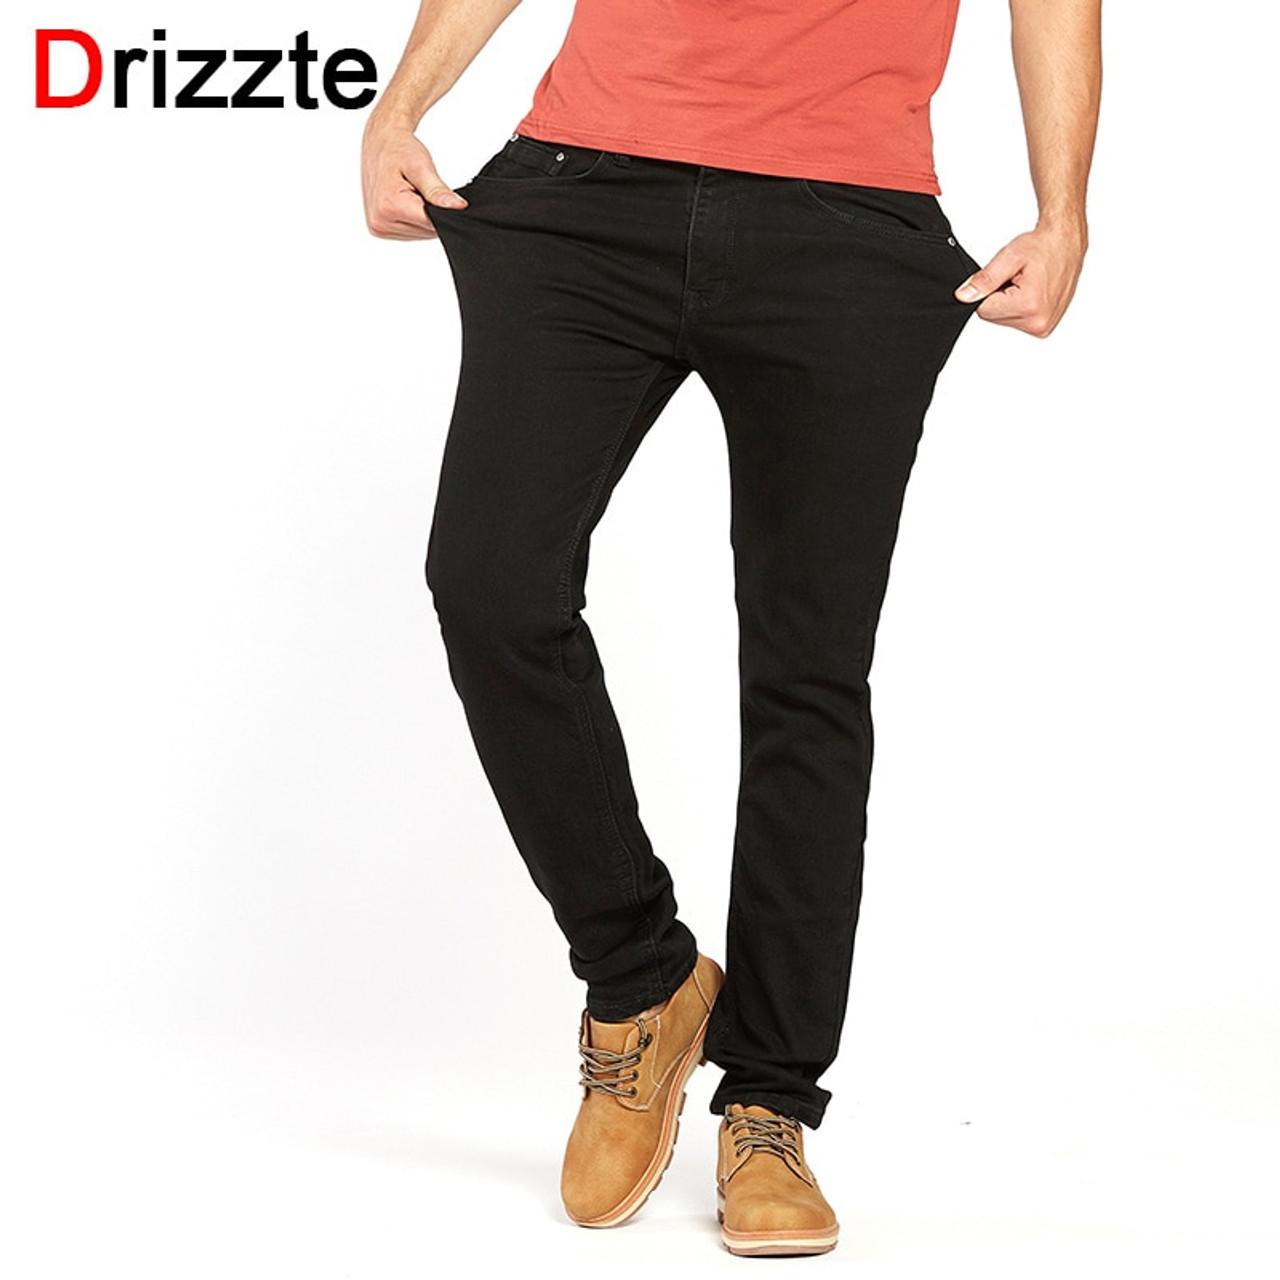 654728b240e Drizzte Men s Jeans Black High Stretch Denim Brand Men Jeans Size 30 32 34  35 36 ...